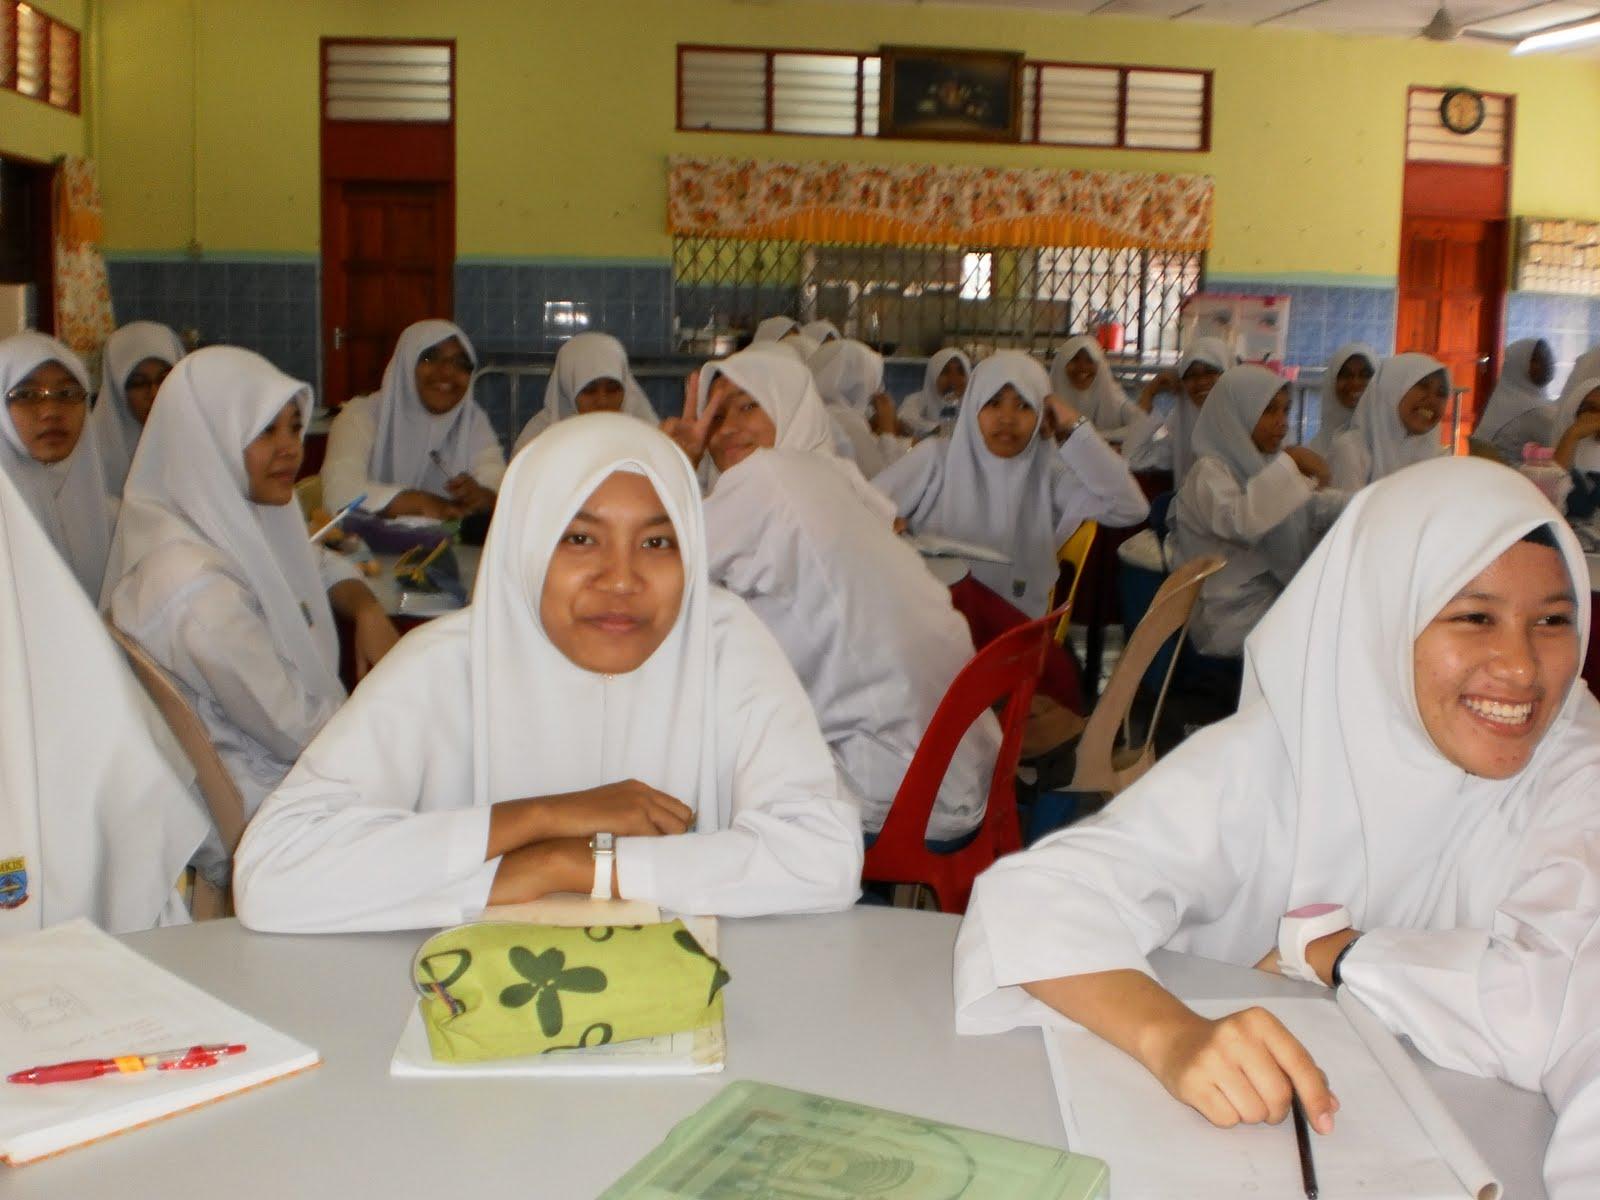 Hari Terakhir Seminar Kecemerlangan SPM 2010 | JURNAL HARIANKU